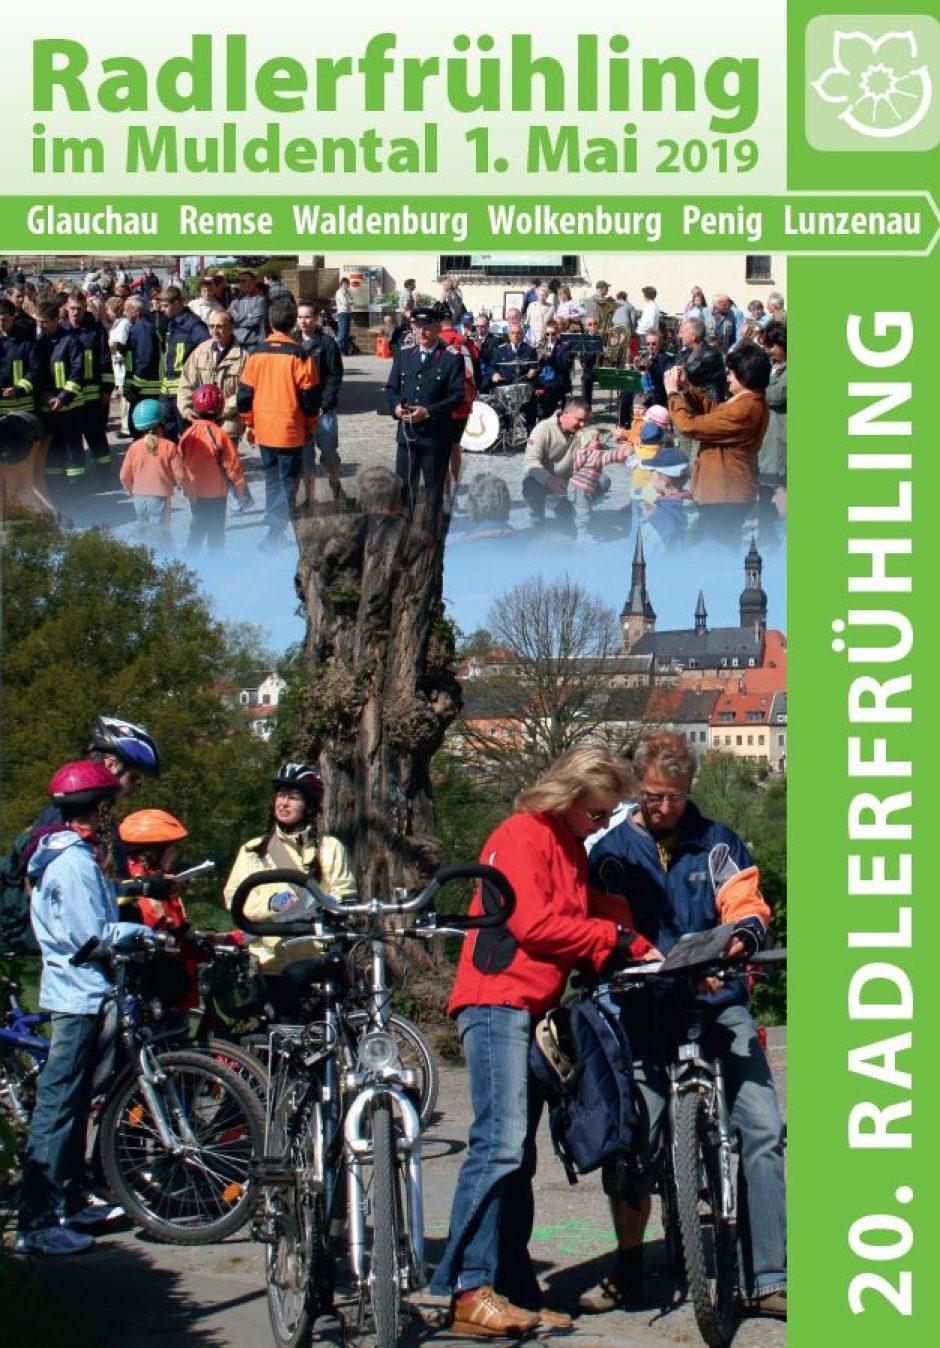 20. Radlerfrühling im Muldental am 1. Mai